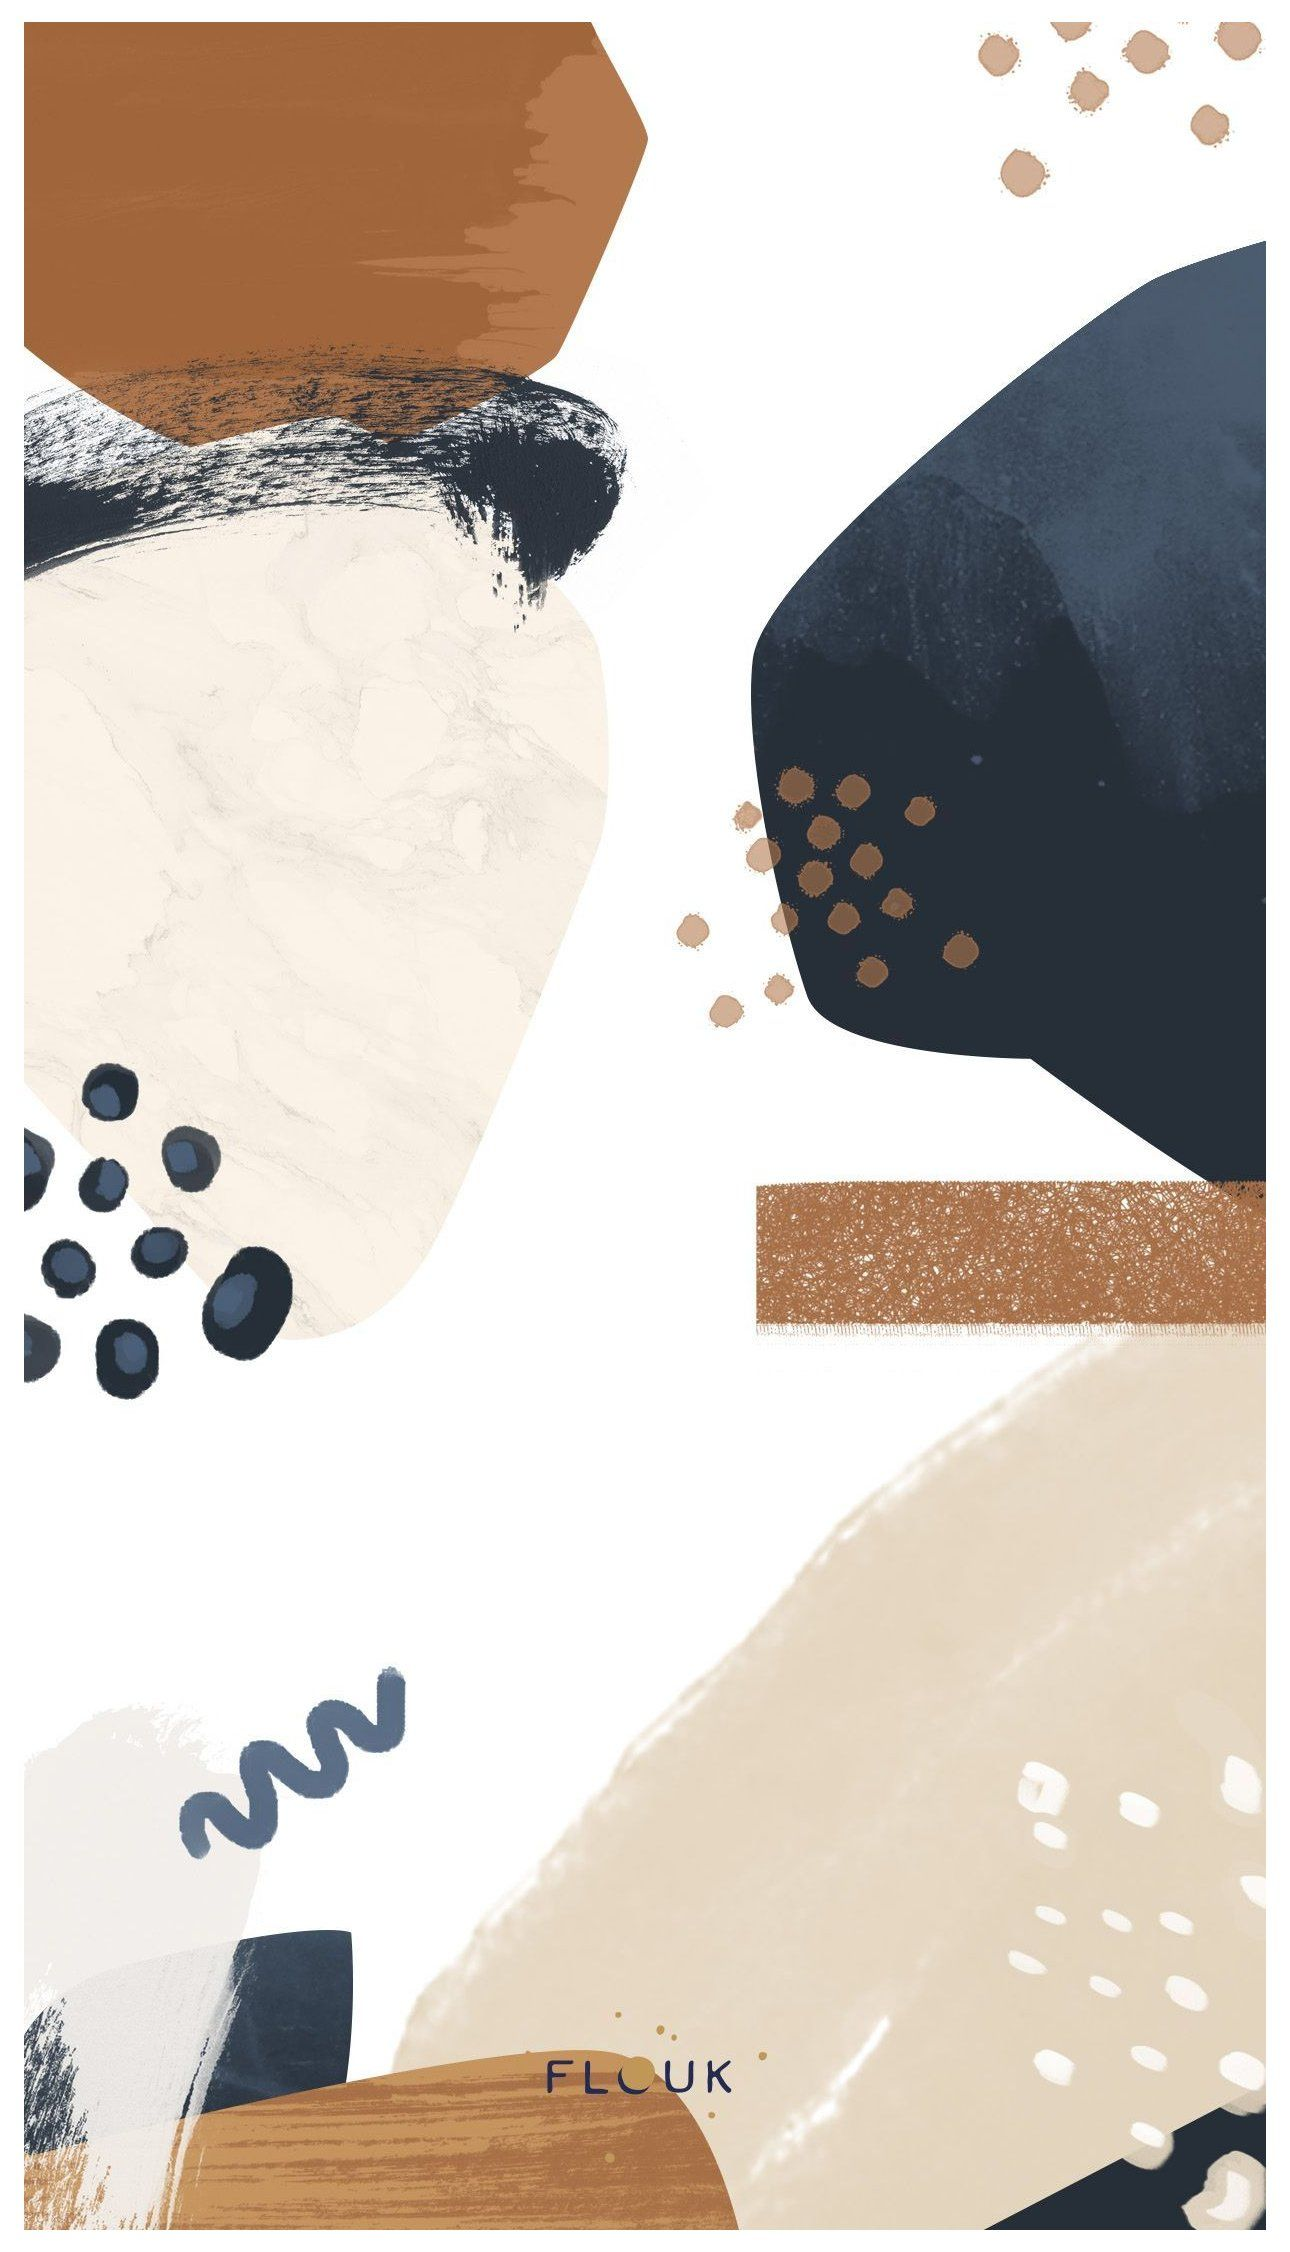 poster background design poster background design simple